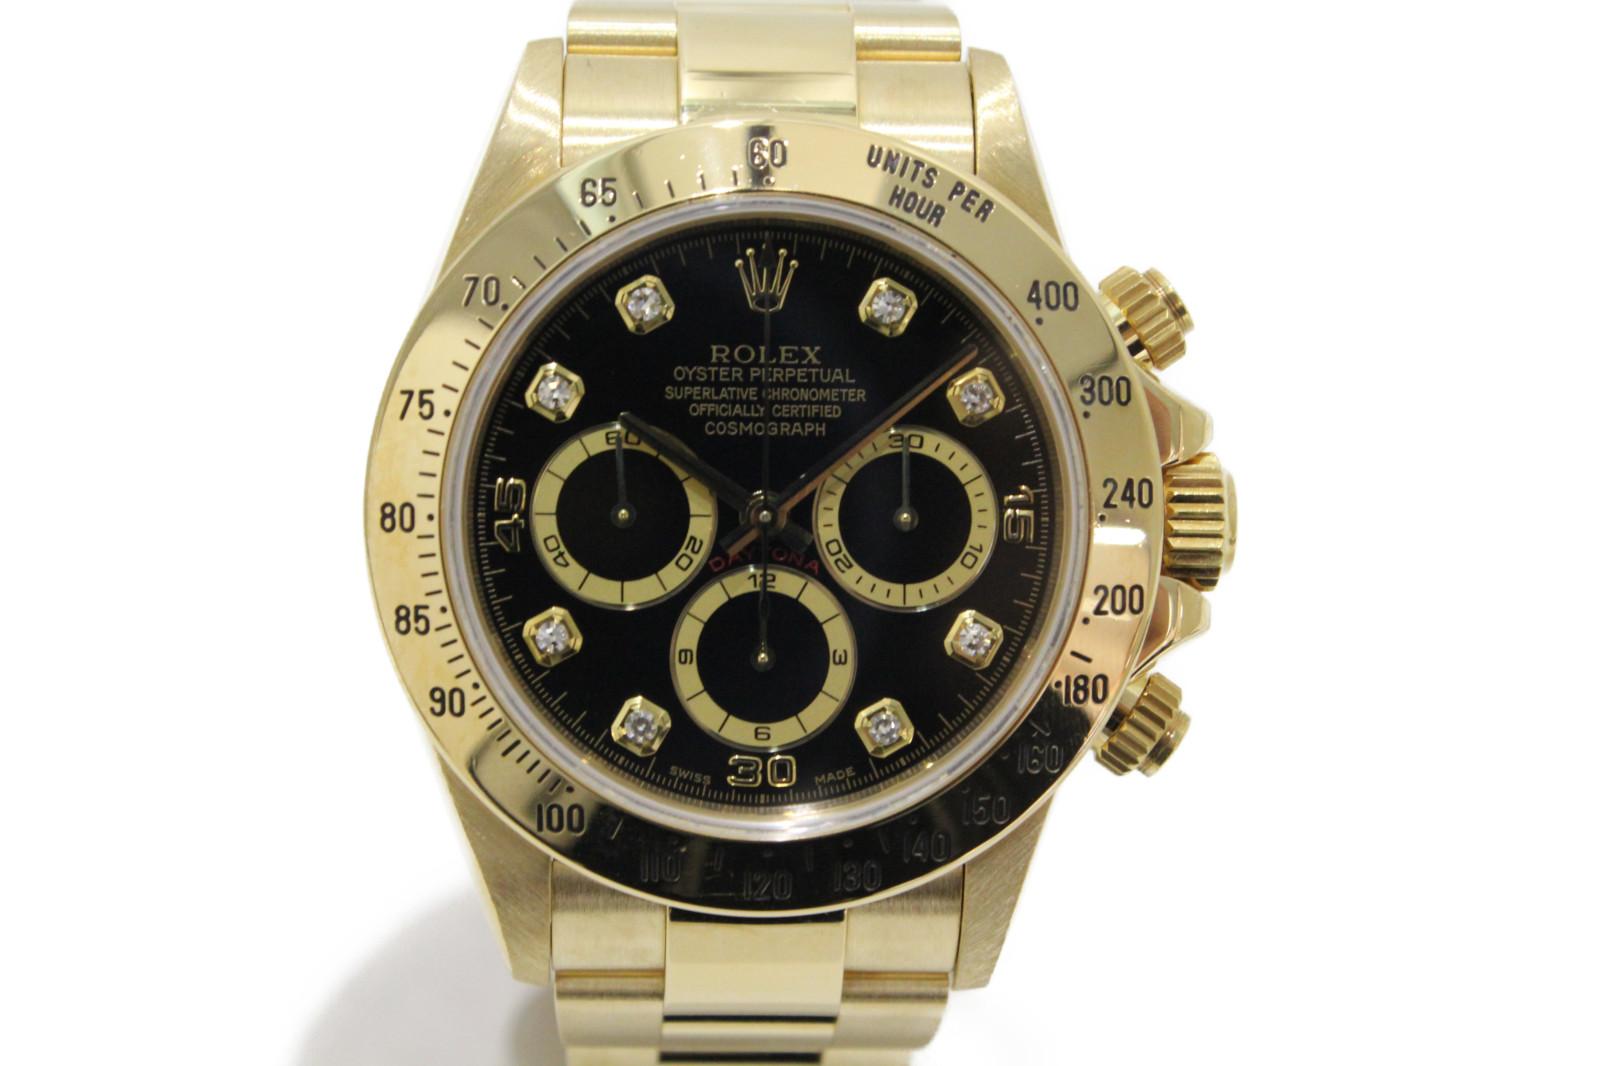 【OH済】ROLEX ロレックス デイトナ 16528G 自動巻き クロノグラフ ダイヤモンド K18 イエローゴールド 金無垢 ブラック メンズ 腕時計【中古】